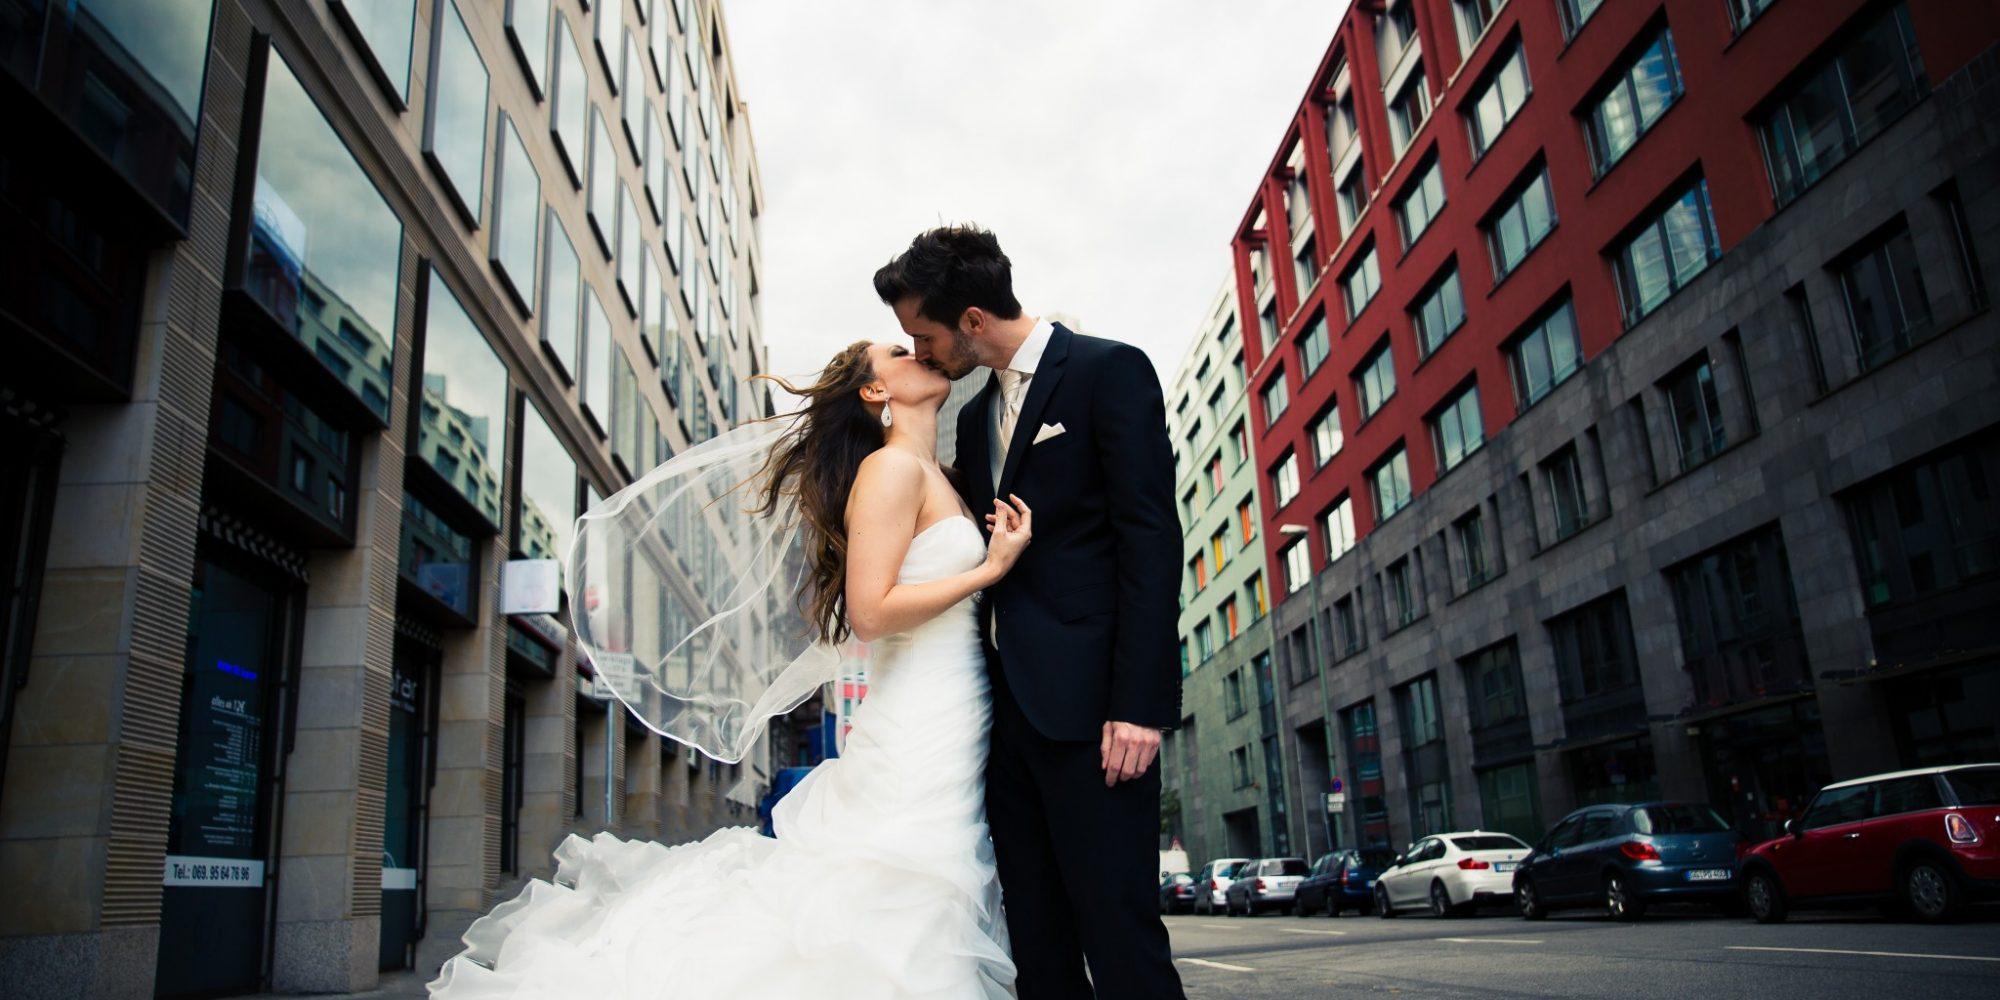 Fearless Photographers und WhiteWedding